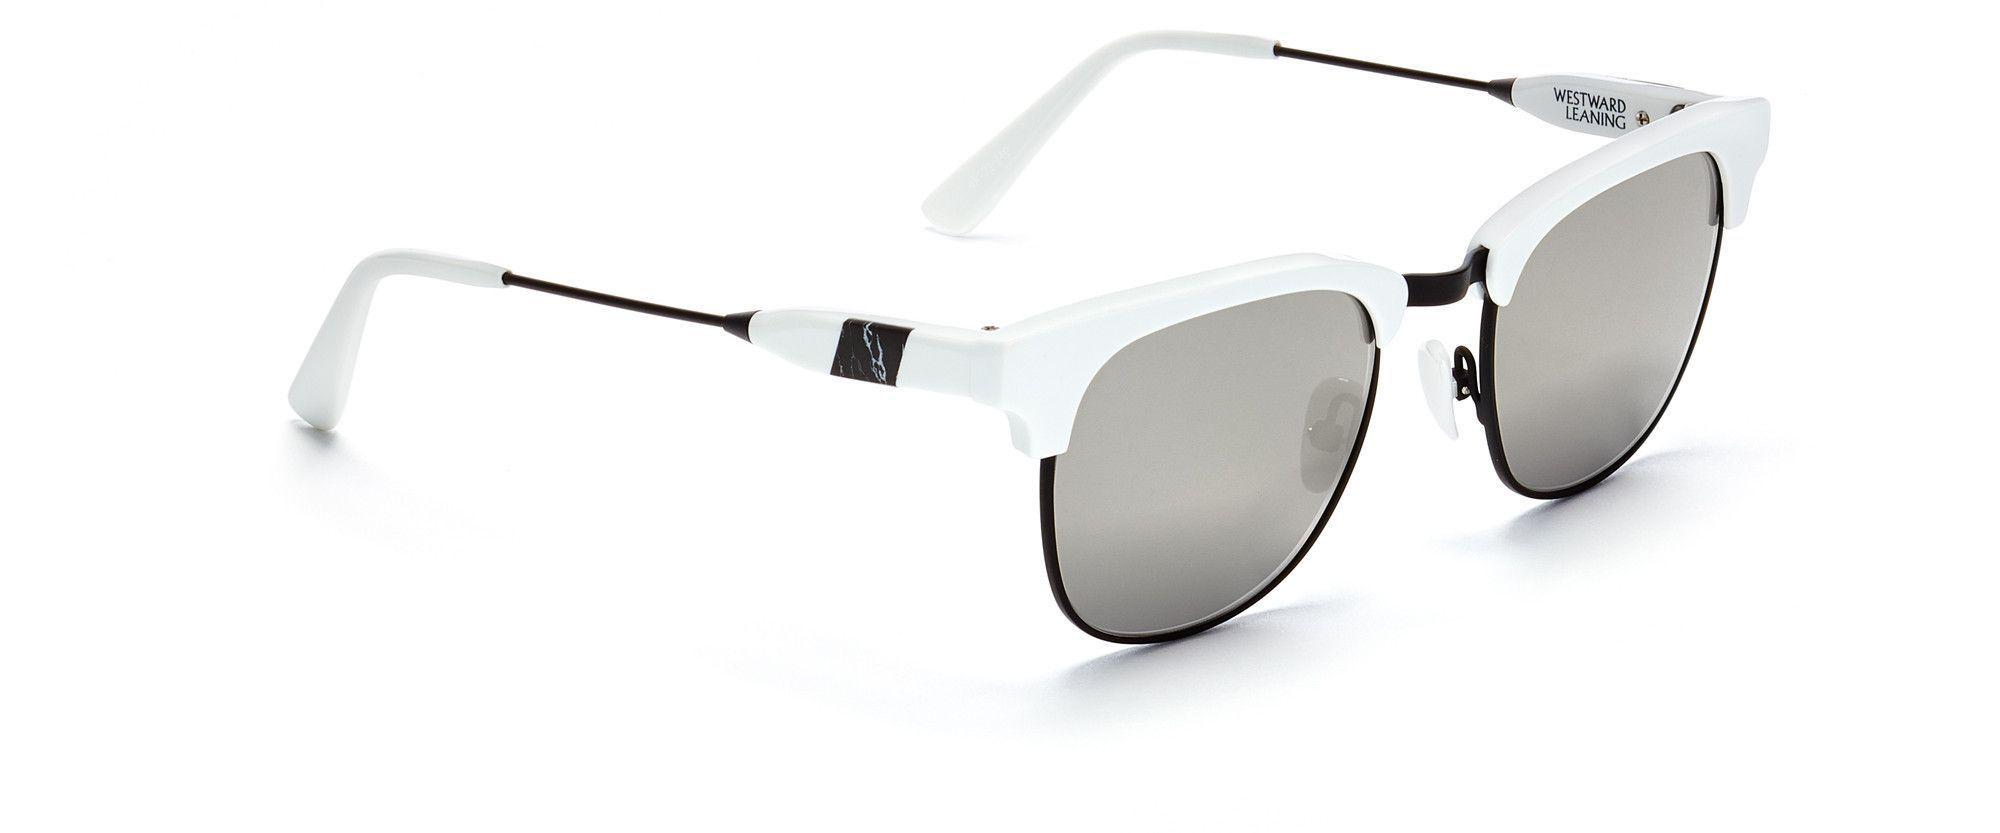 c744b195247 Westward Leaning - Handmade Sunglasses   Westward Leaning